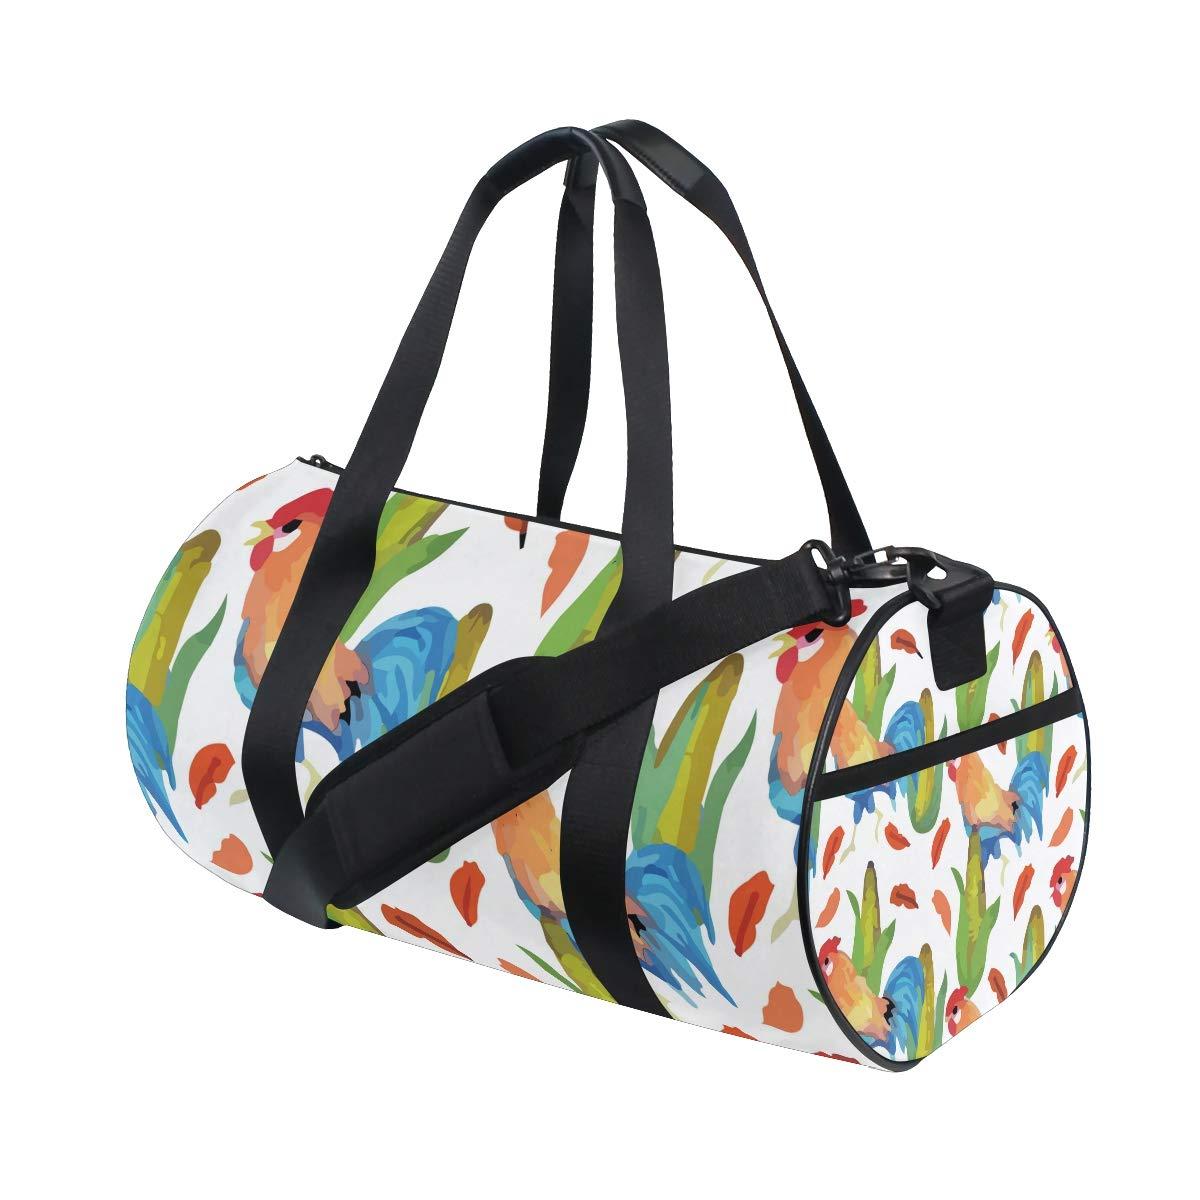 Sports Gym Duffel Barrel Bag Rooster Corn Harvest Farm Travel Luggage Handbag for Men Women